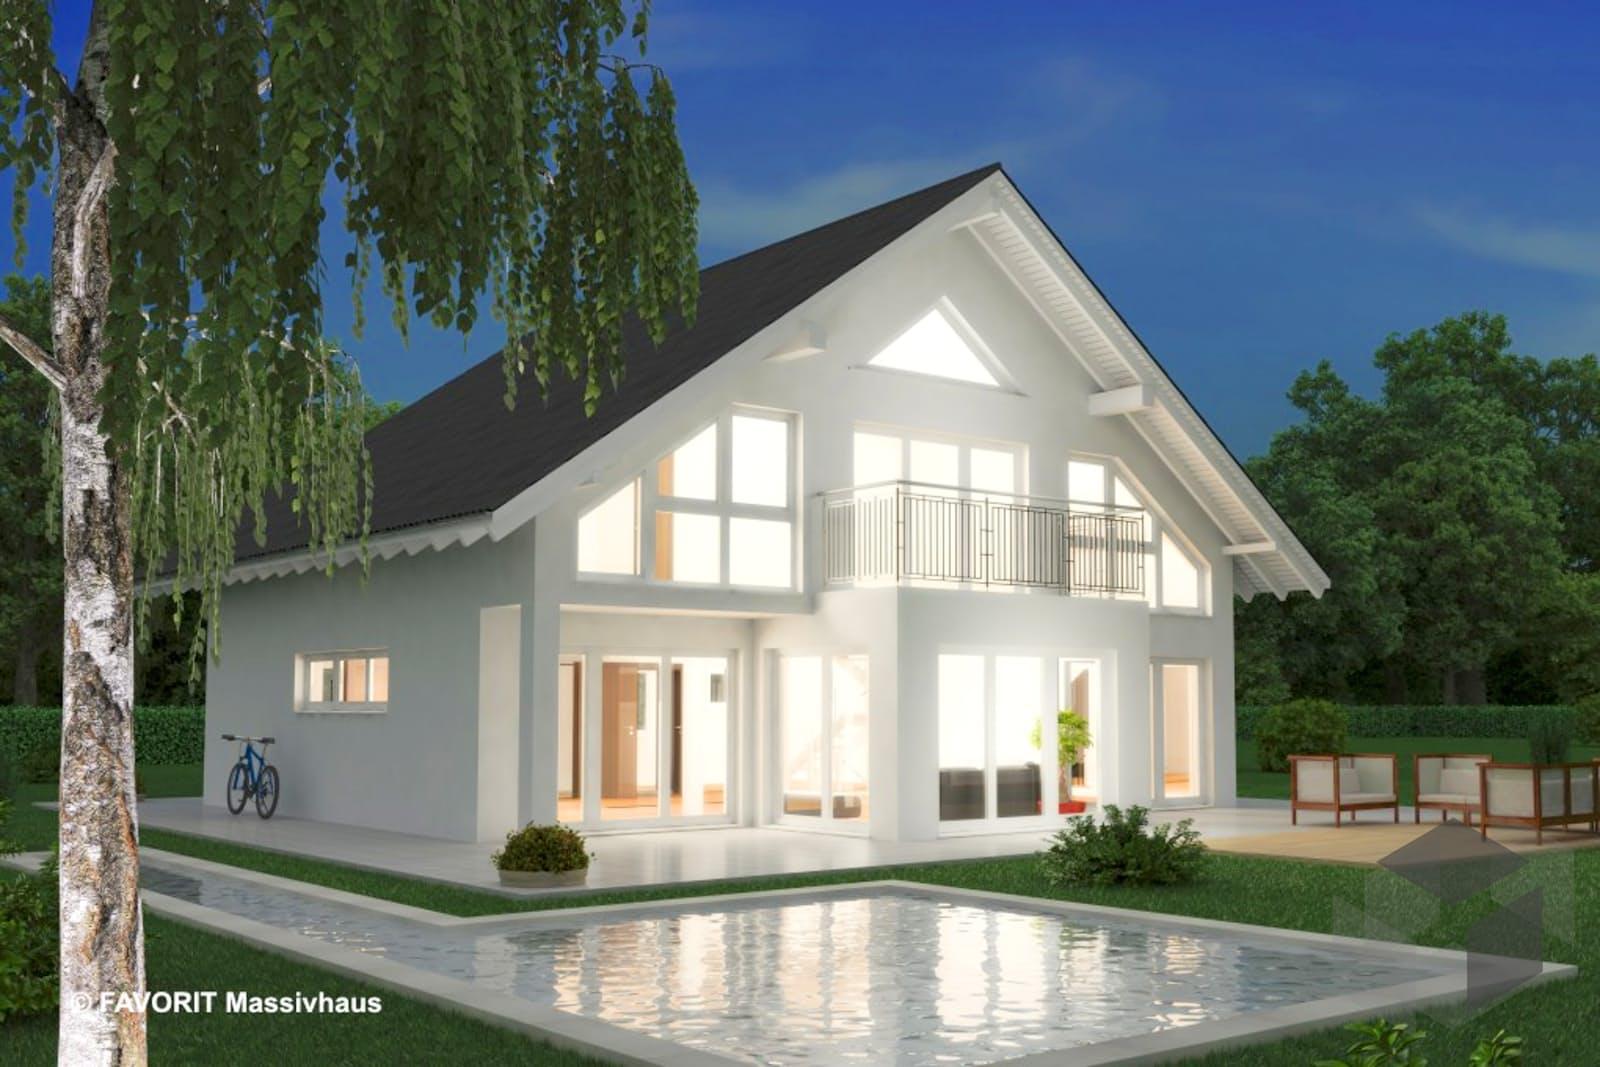 noblesse 195 von favorit massivhaus komplette daten bersicht. Black Bedroom Furniture Sets. Home Design Ideas